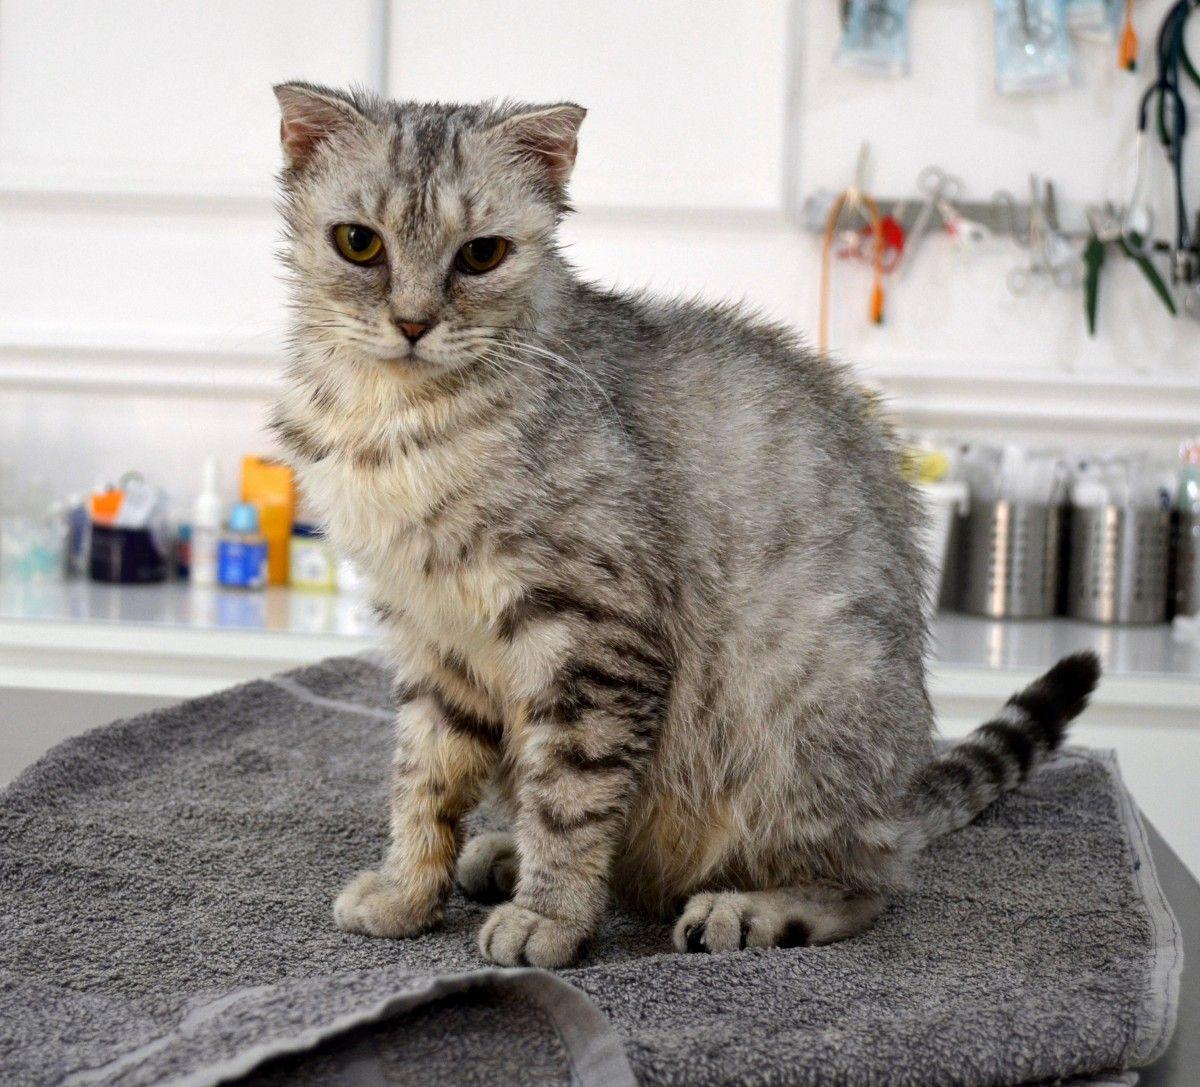 Scottish Fold For Adoption Cats Dubai Adopt My Pets Scottish Fold Cat Adoption Pets Cats